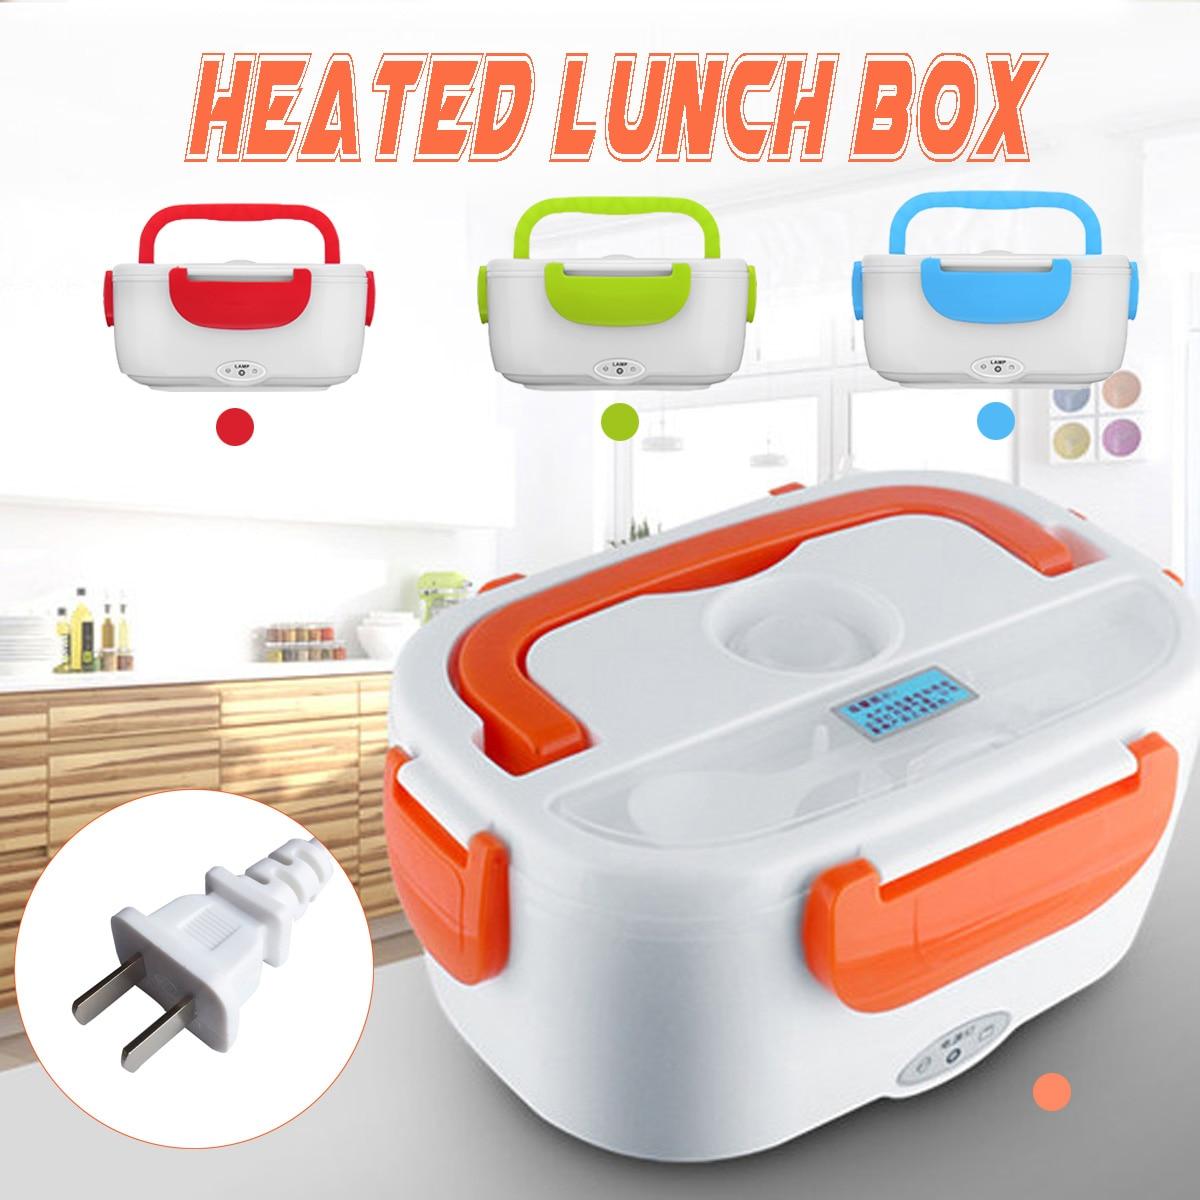 Elektrische Heizung Lunch Box 110 V Tragbare Multi-Functional Food-Grade Food Container Lebensmittel Wärmer Camping Reisen Heizung